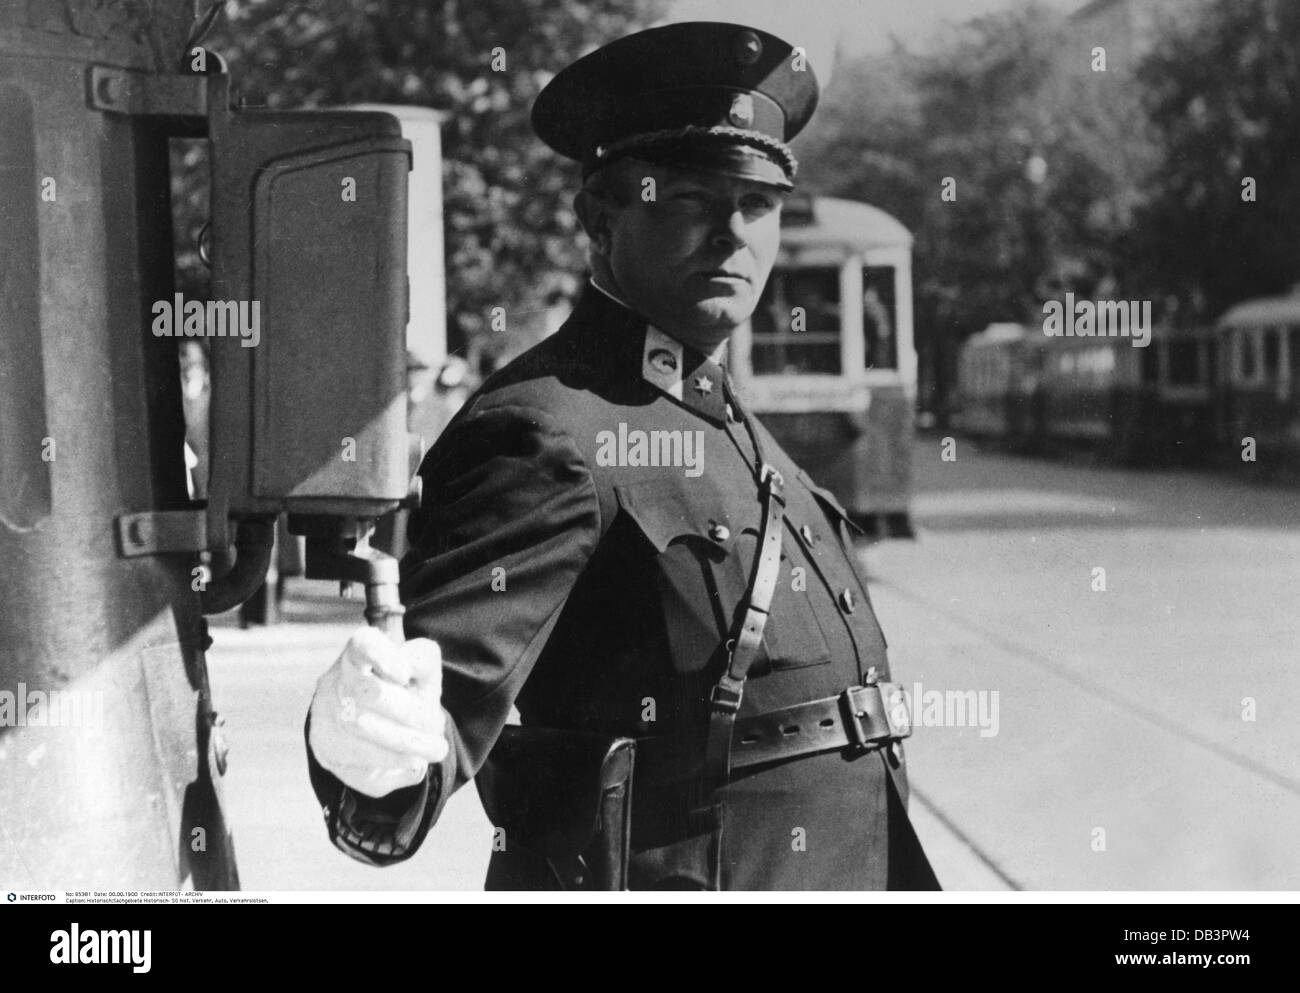 transport / transportation, car, traffic controller, traffic policeman during regulations of the traffic light circuit - Stock Image